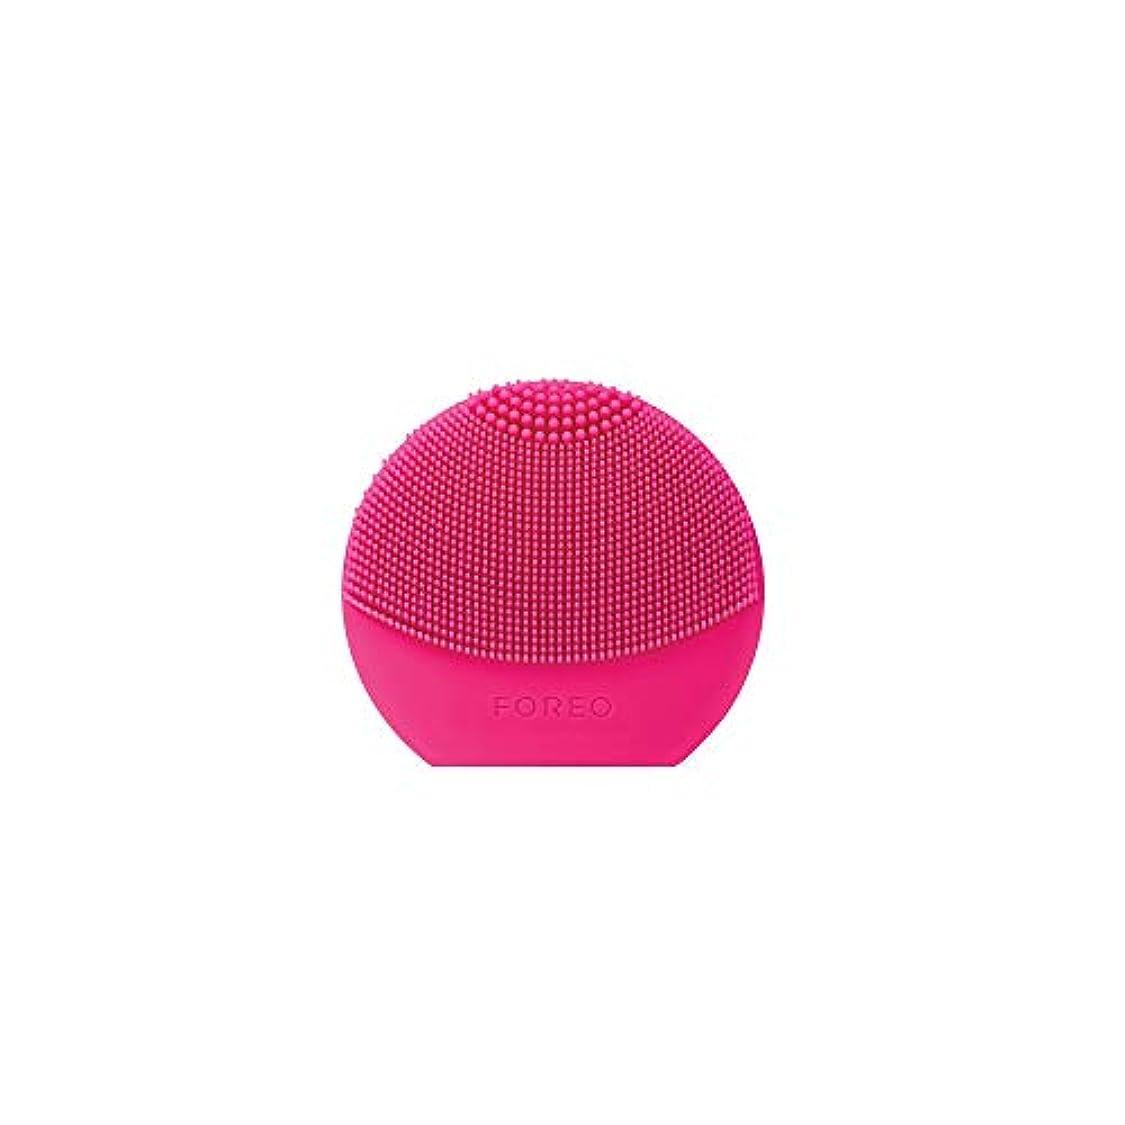 FOREO LUNA play plus フクシア シリコーン製 音波振動 電動洗顔ブラシ 電池式